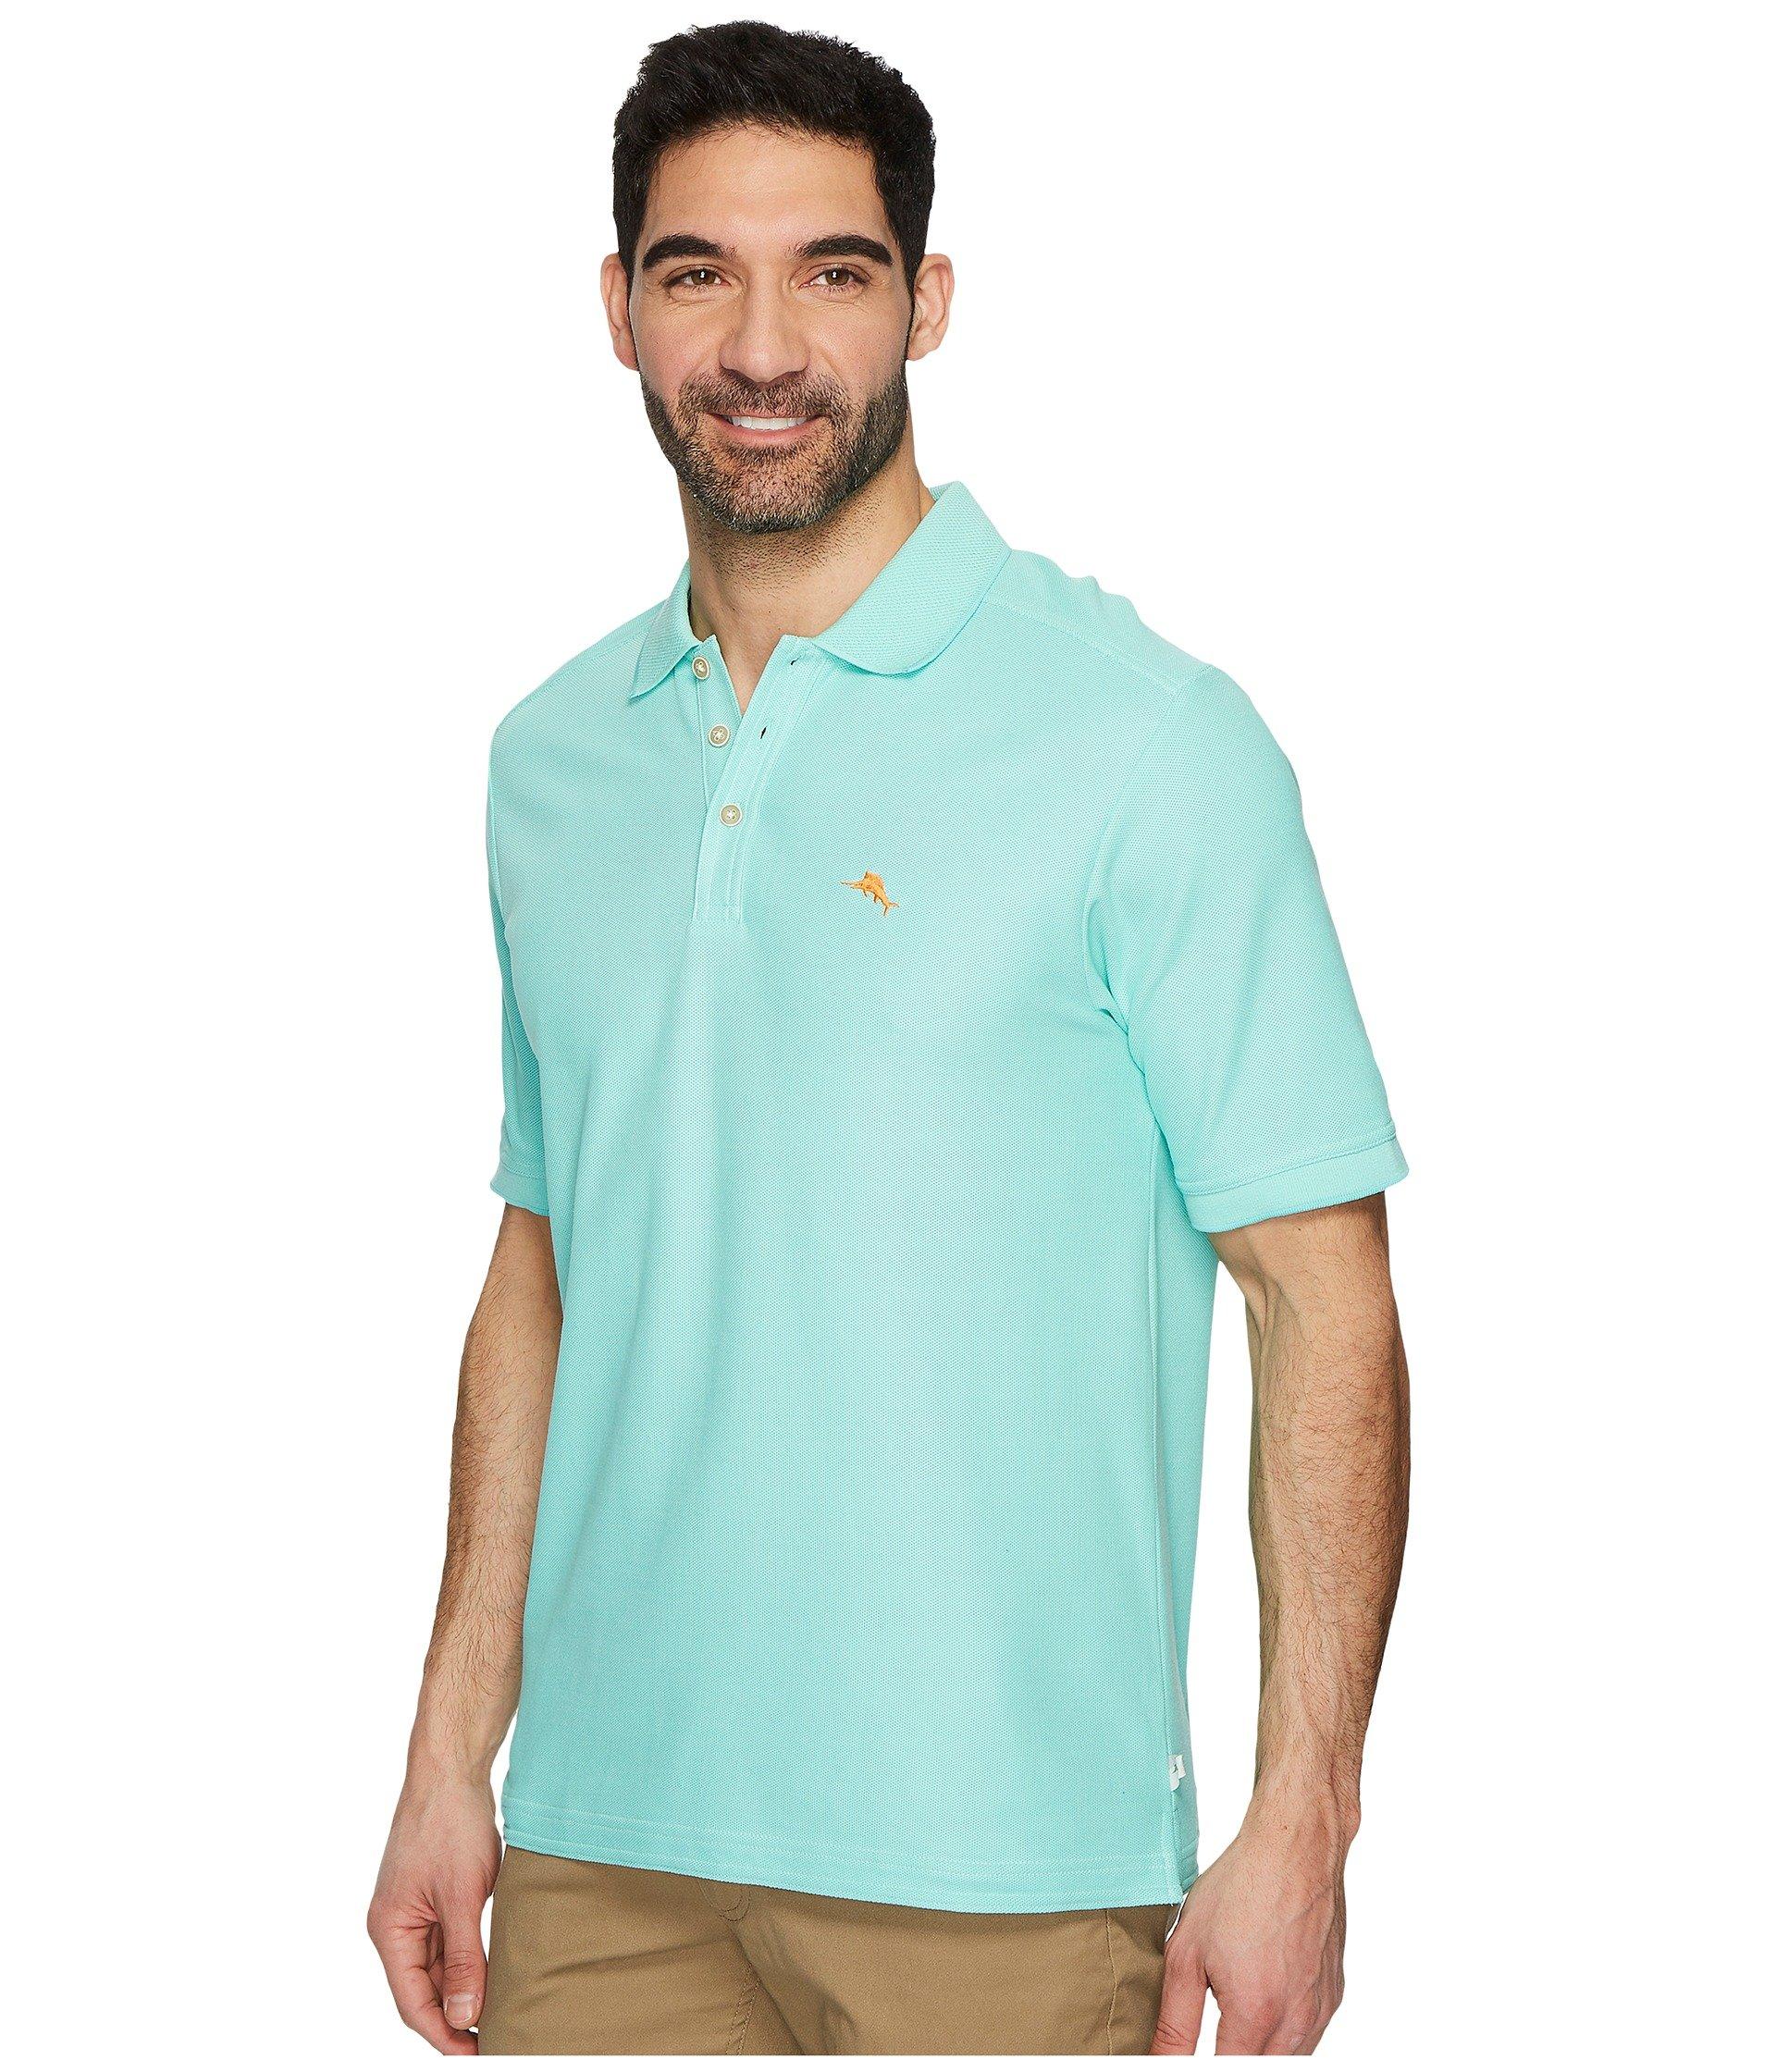 Emfielder Mojito Polo The Tommy Shirt Bahama Mint UEqSW6